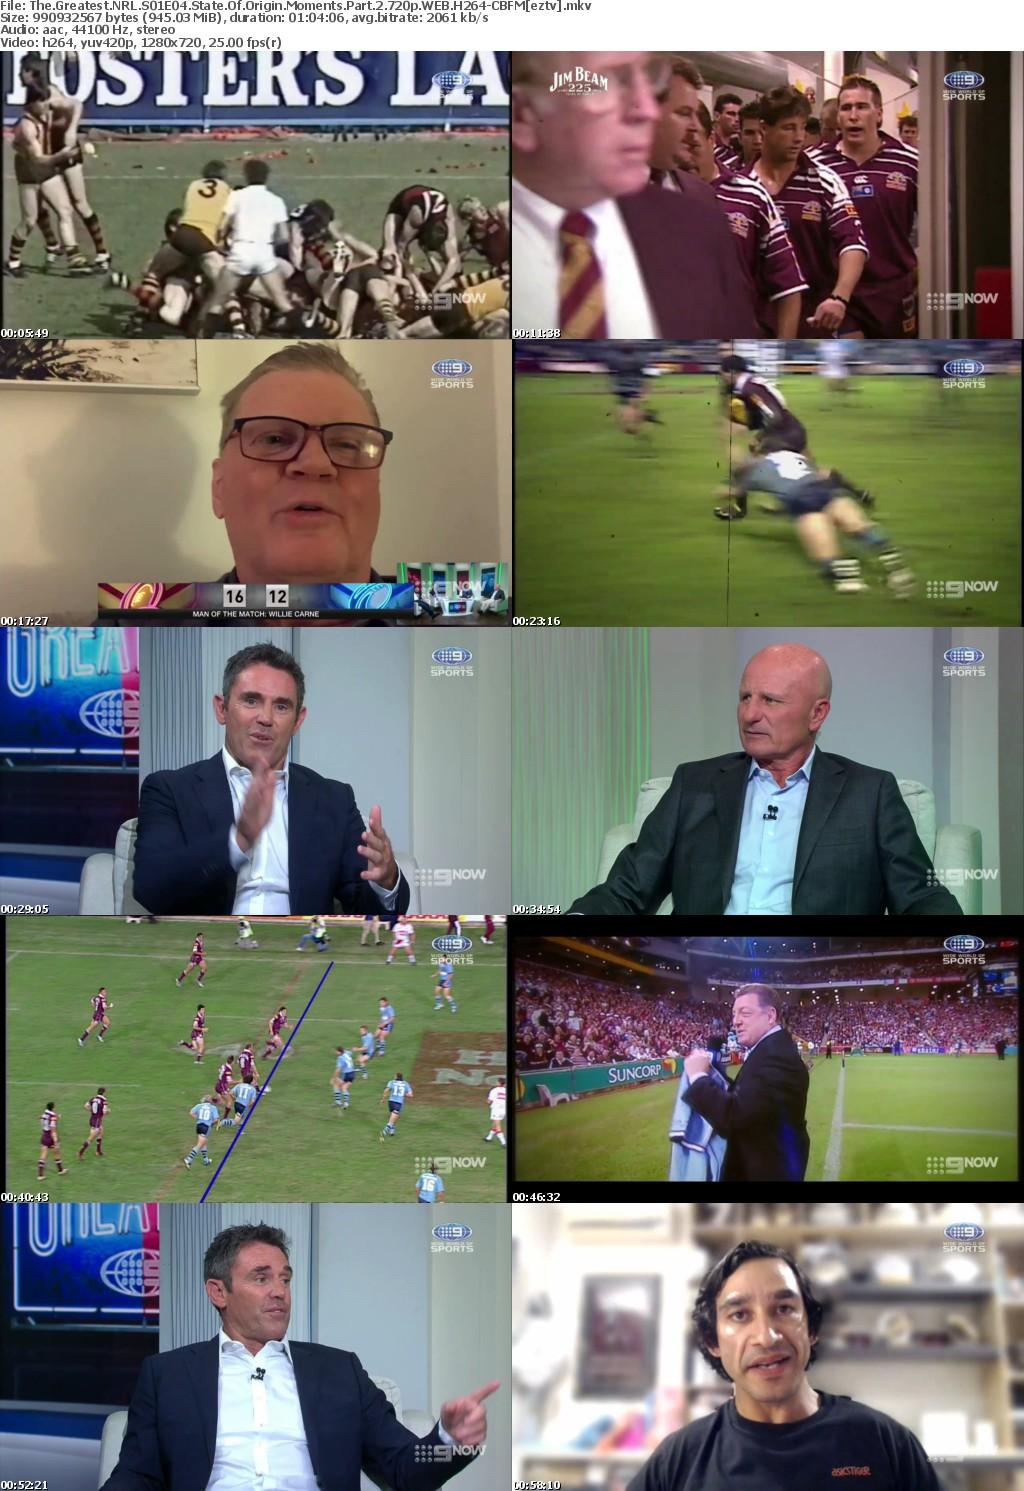 The Greatest NRL S01E04 State Of Origin Moments Part 2 720p WEB H264-CBFM